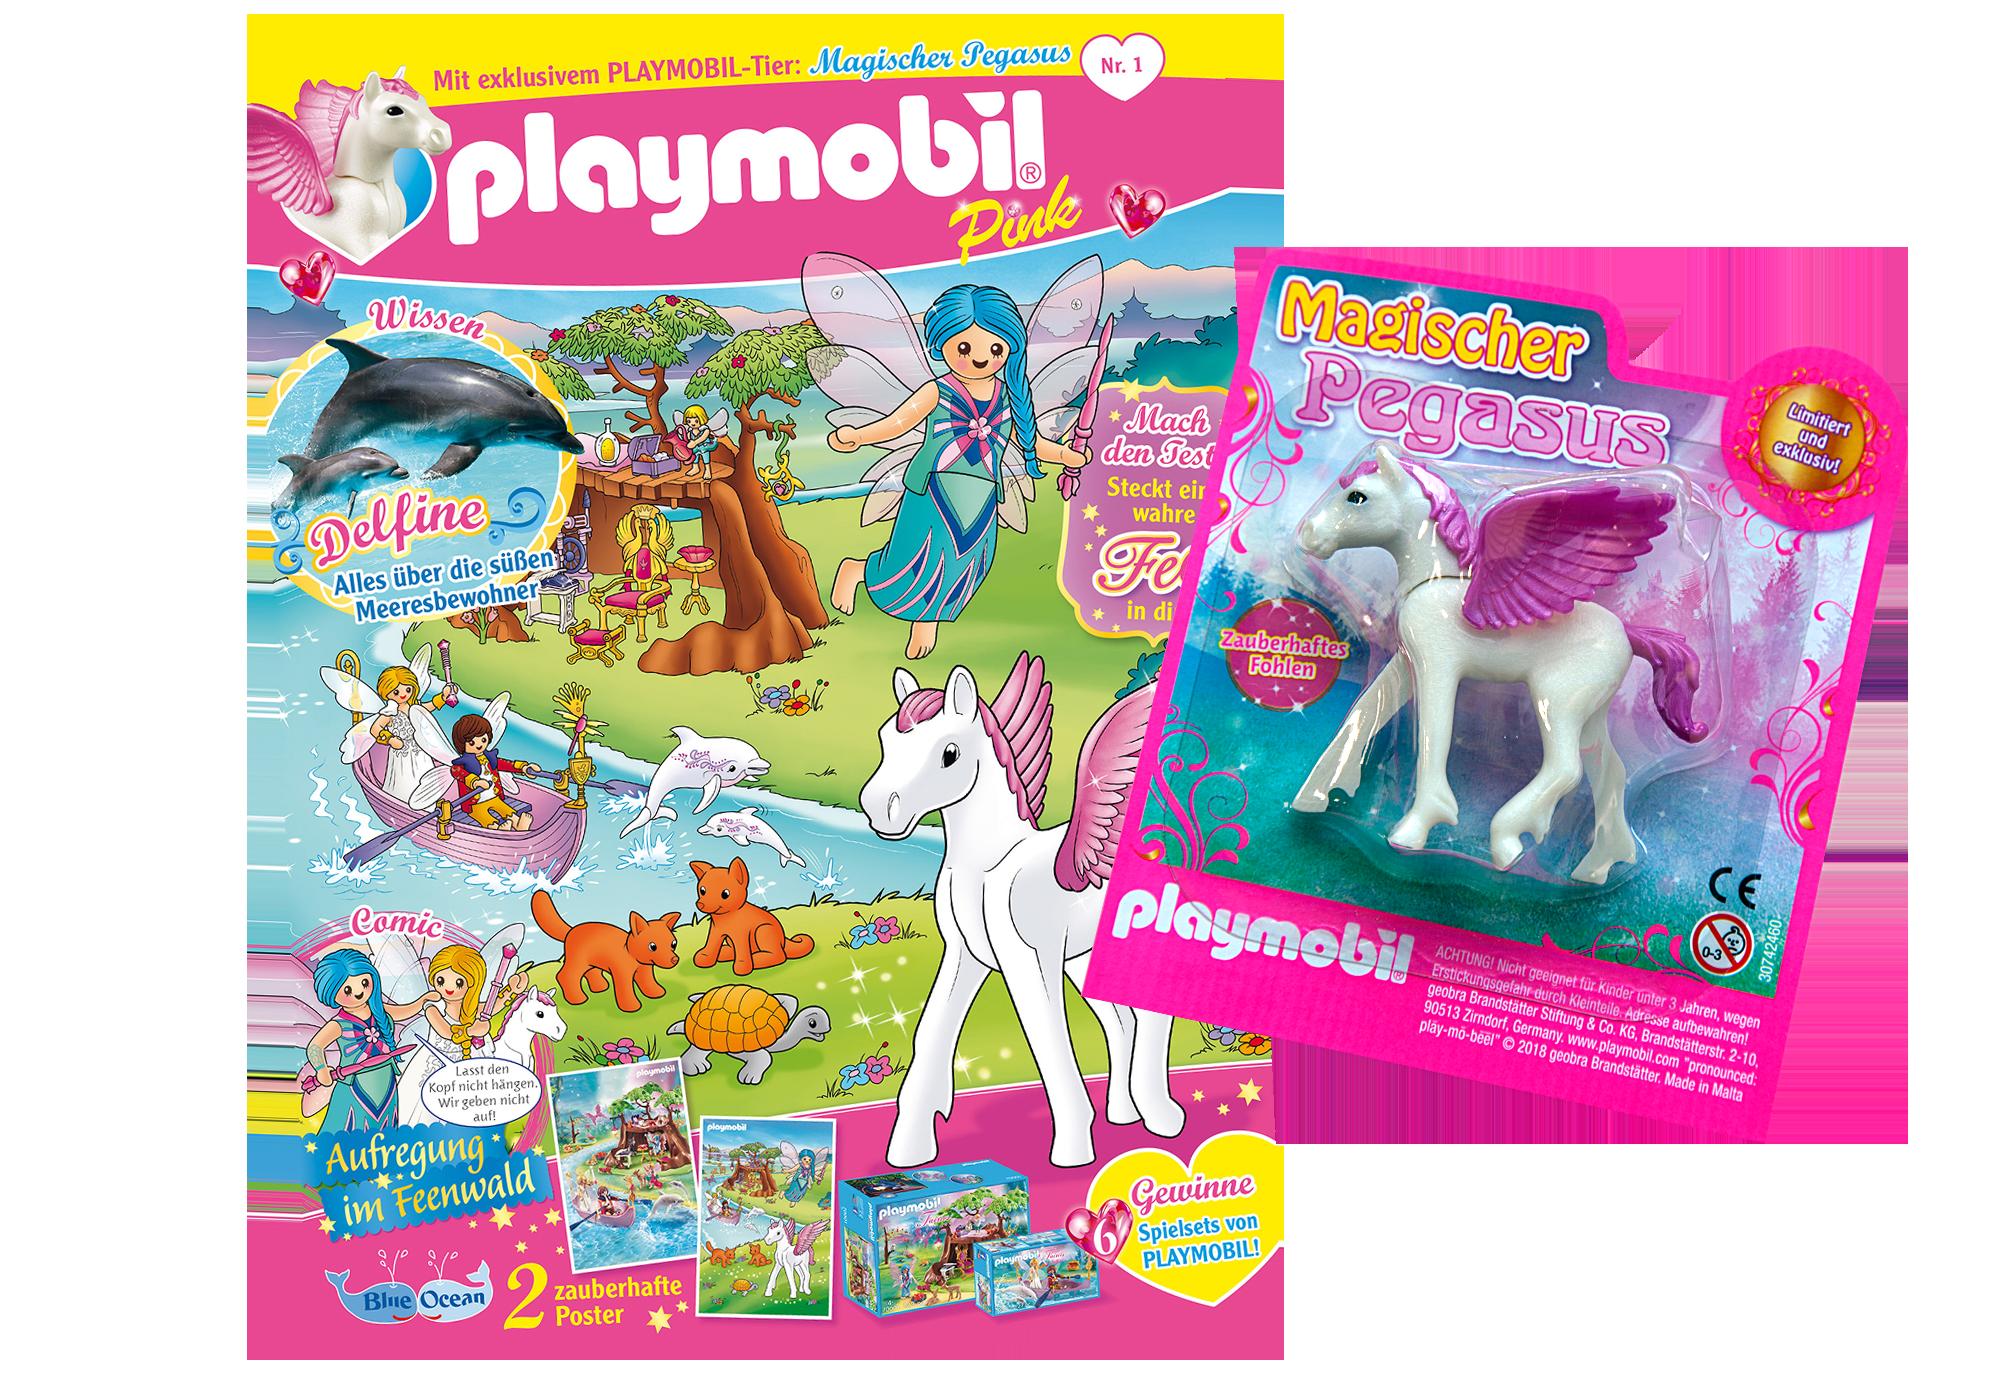 http://media.playmobil.com/i/playmobil/80619_product_detail/PLAYMOBIL-Magazin Pink 1/2019 (Heft 41)